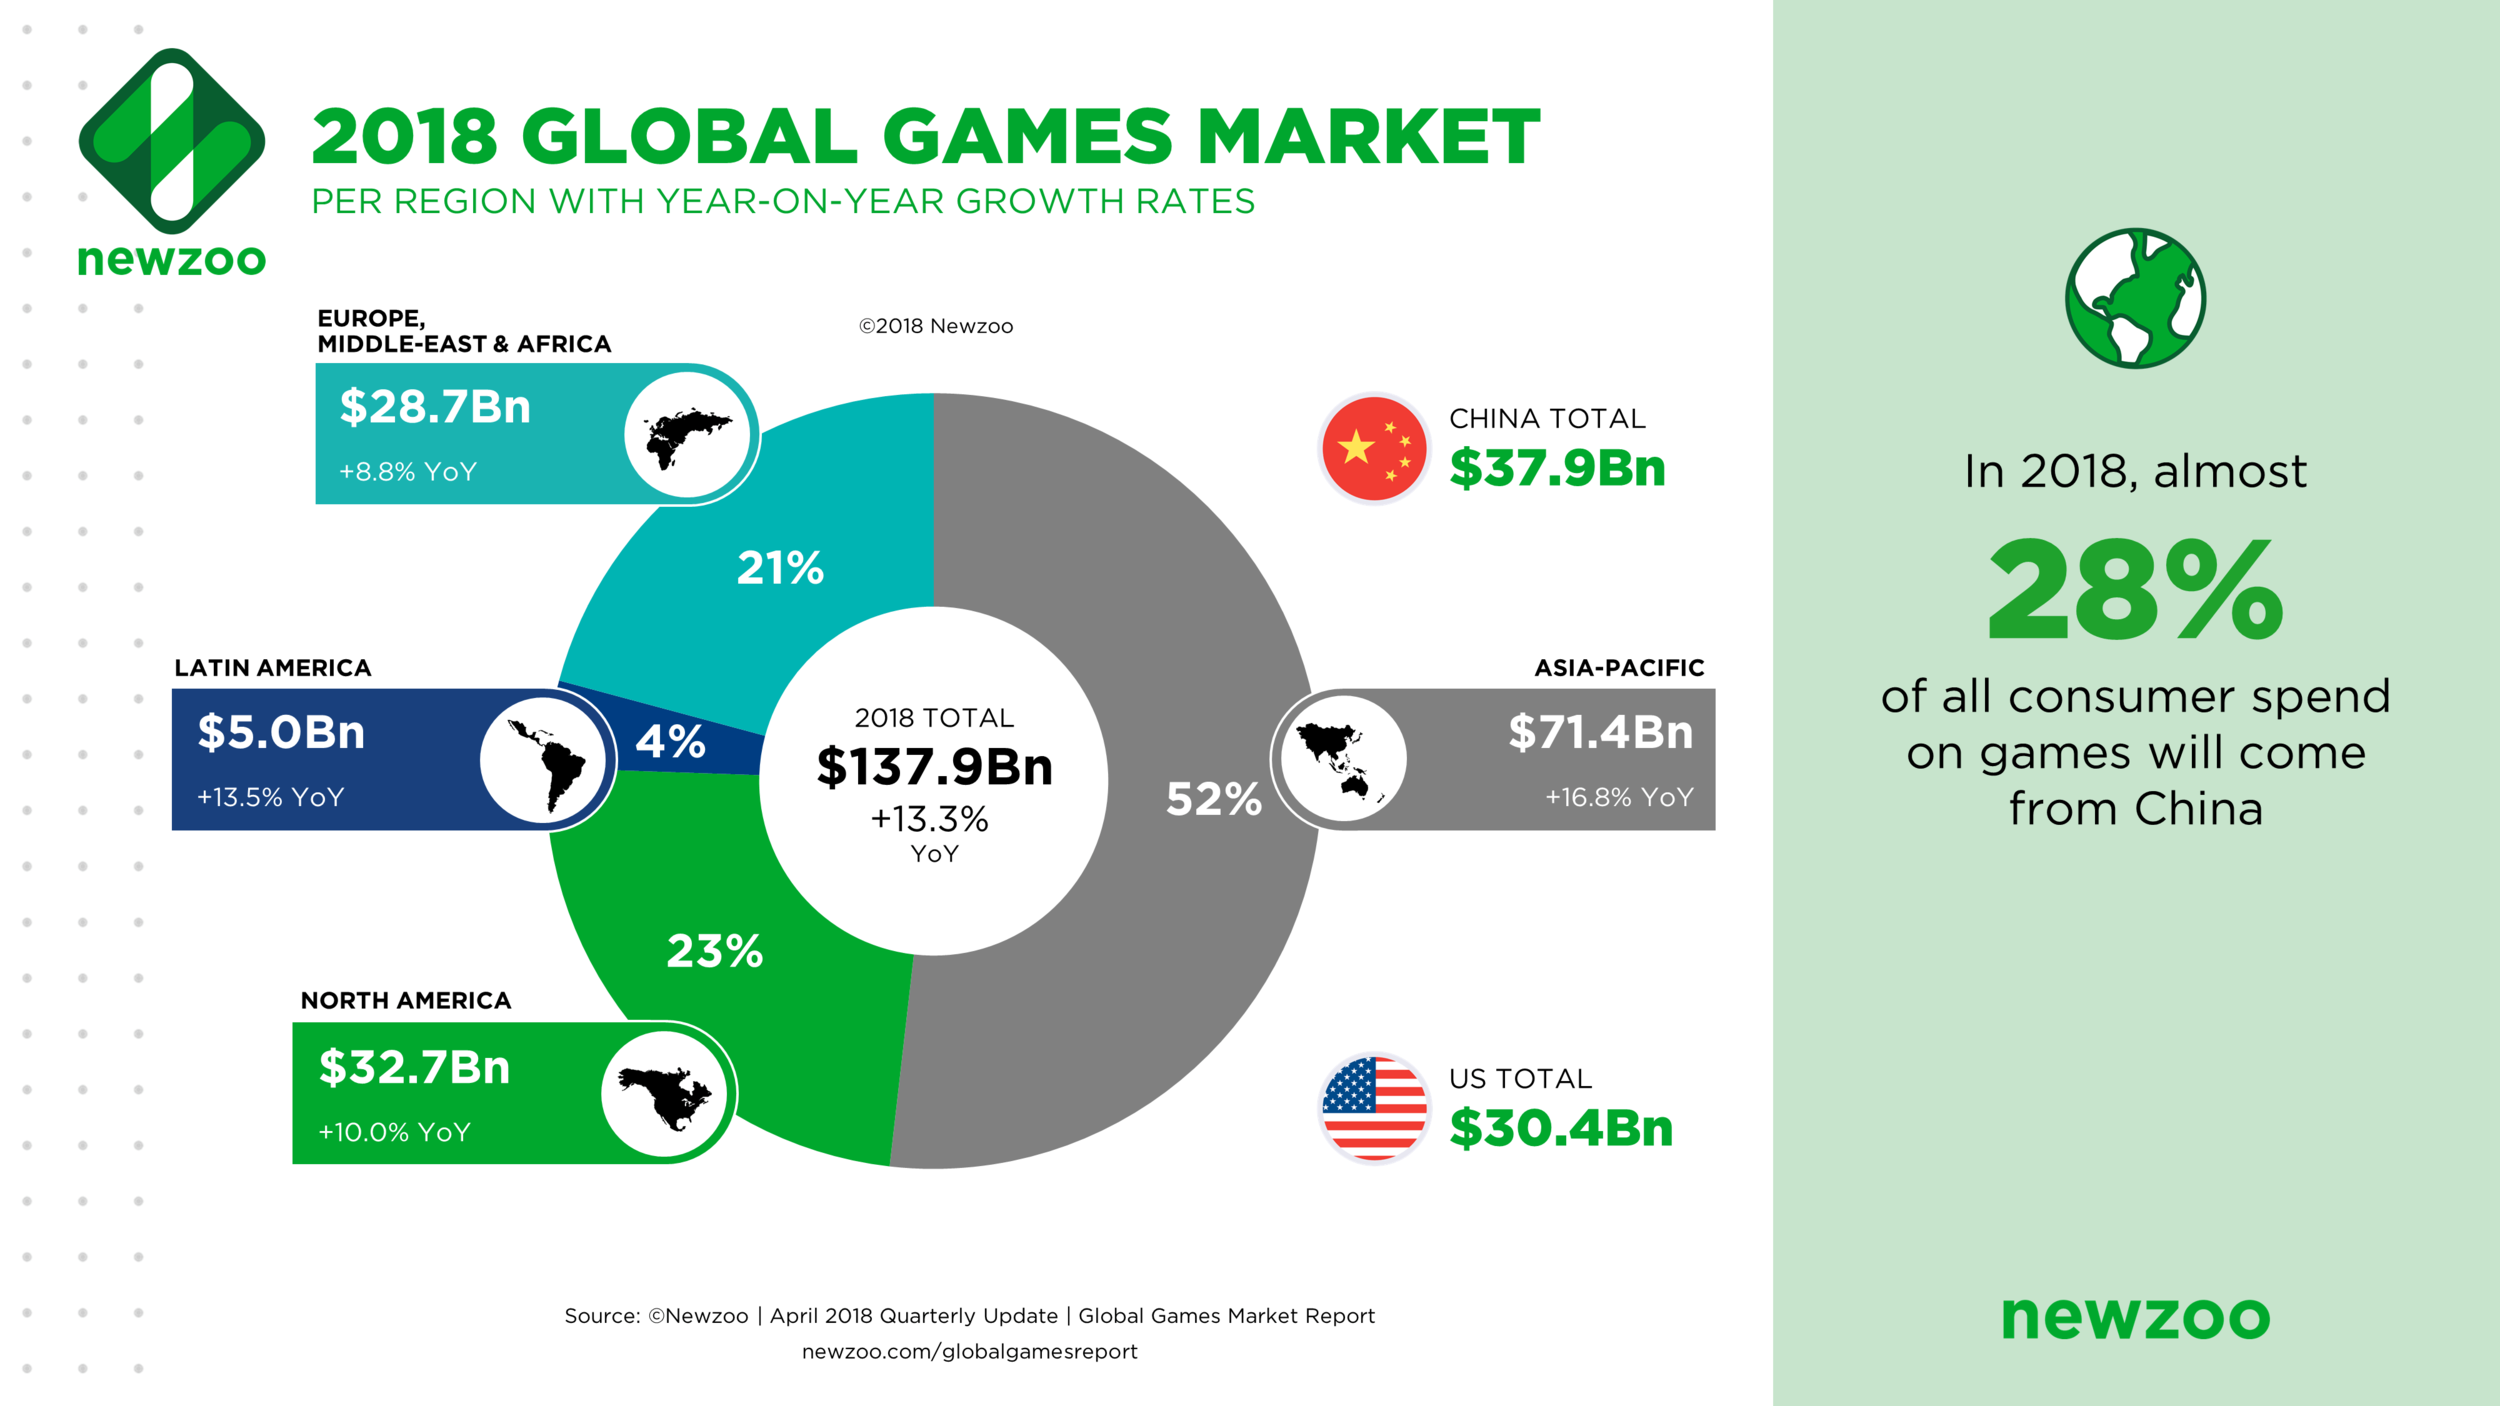 Global_Games_Market_per_Region_2018.png